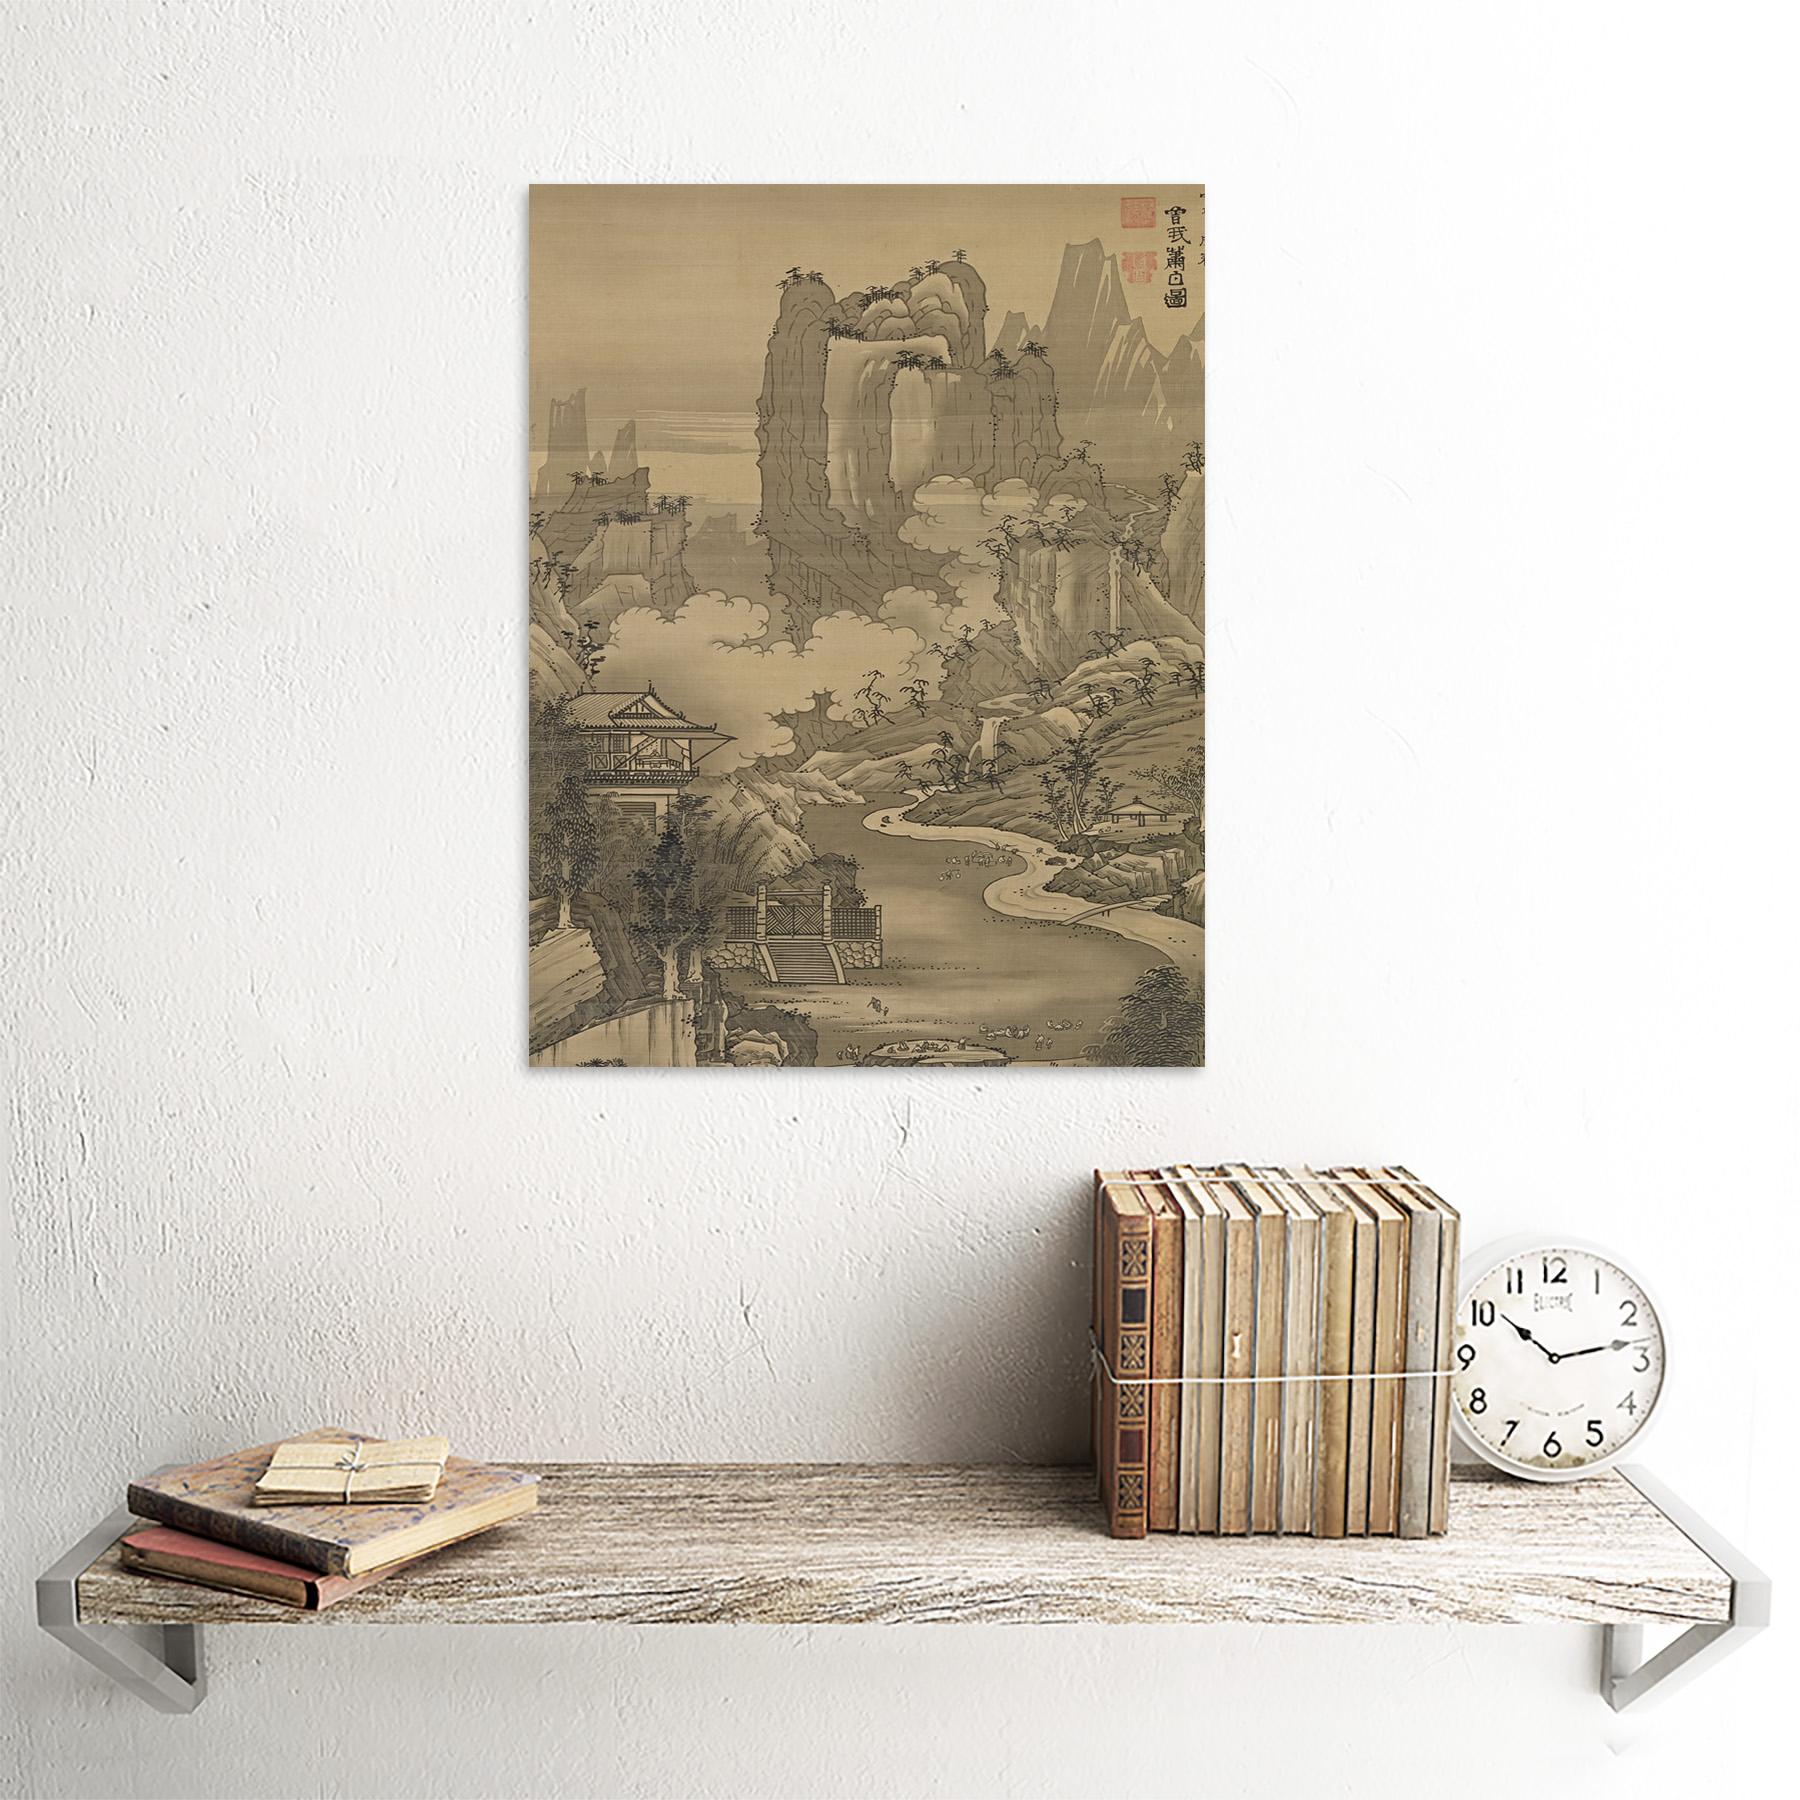 Shohaku-Orchid-Pavilion-Gathering-Screen-Painting-Wall-Art-Print-Framed-12x16 thumbnail 23